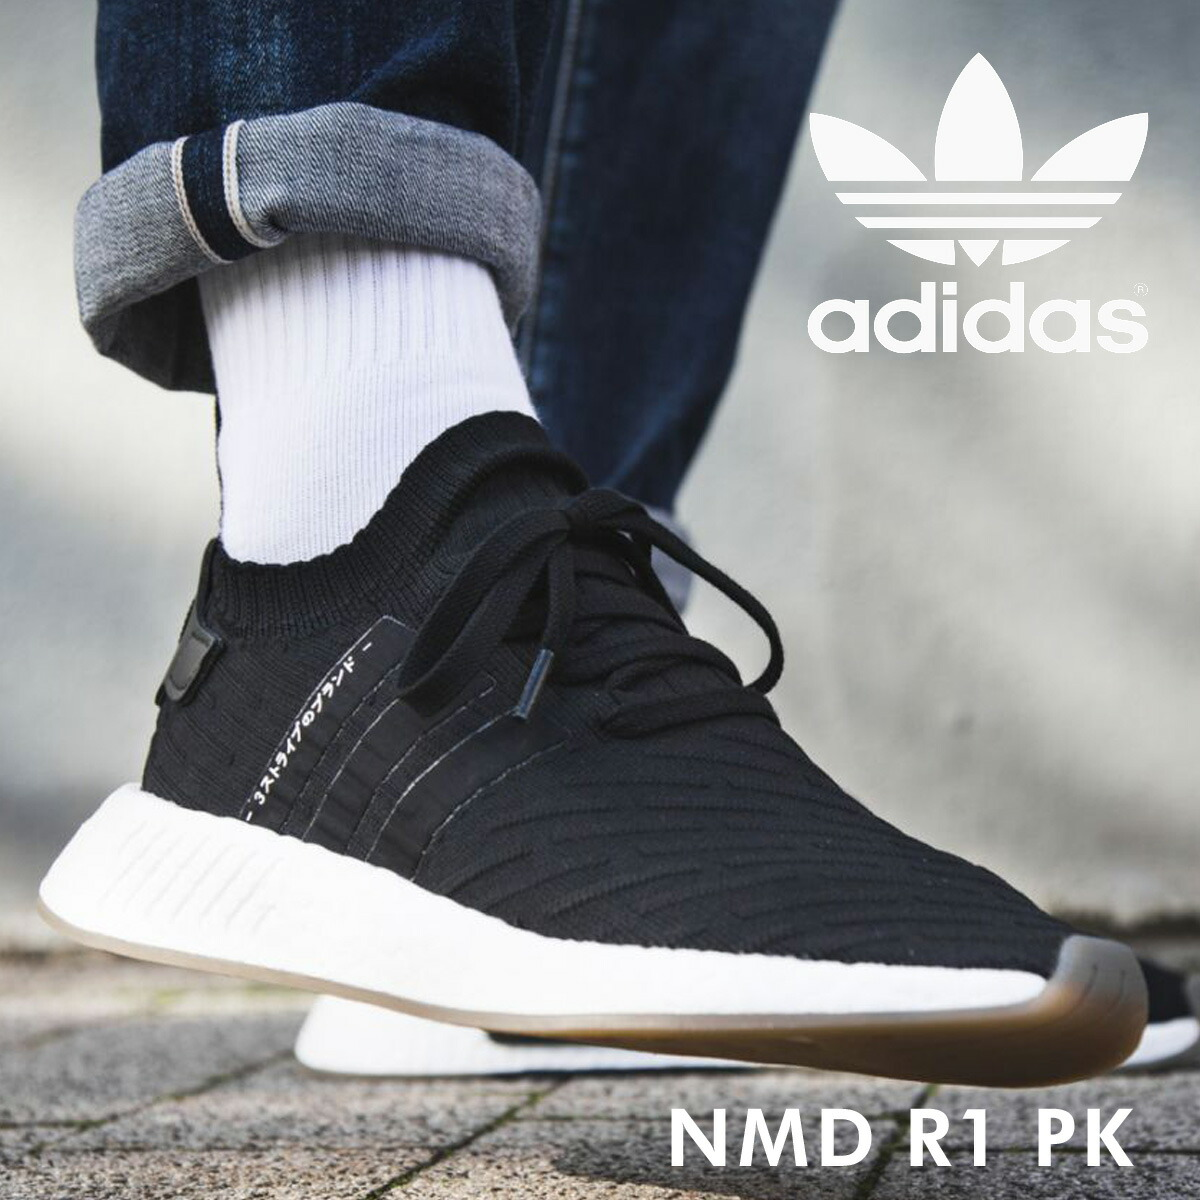 0b1dc0c21fe47 Sugar Online Shop  adidas NMD R1 PK Adidas originals sneakers nomad ...